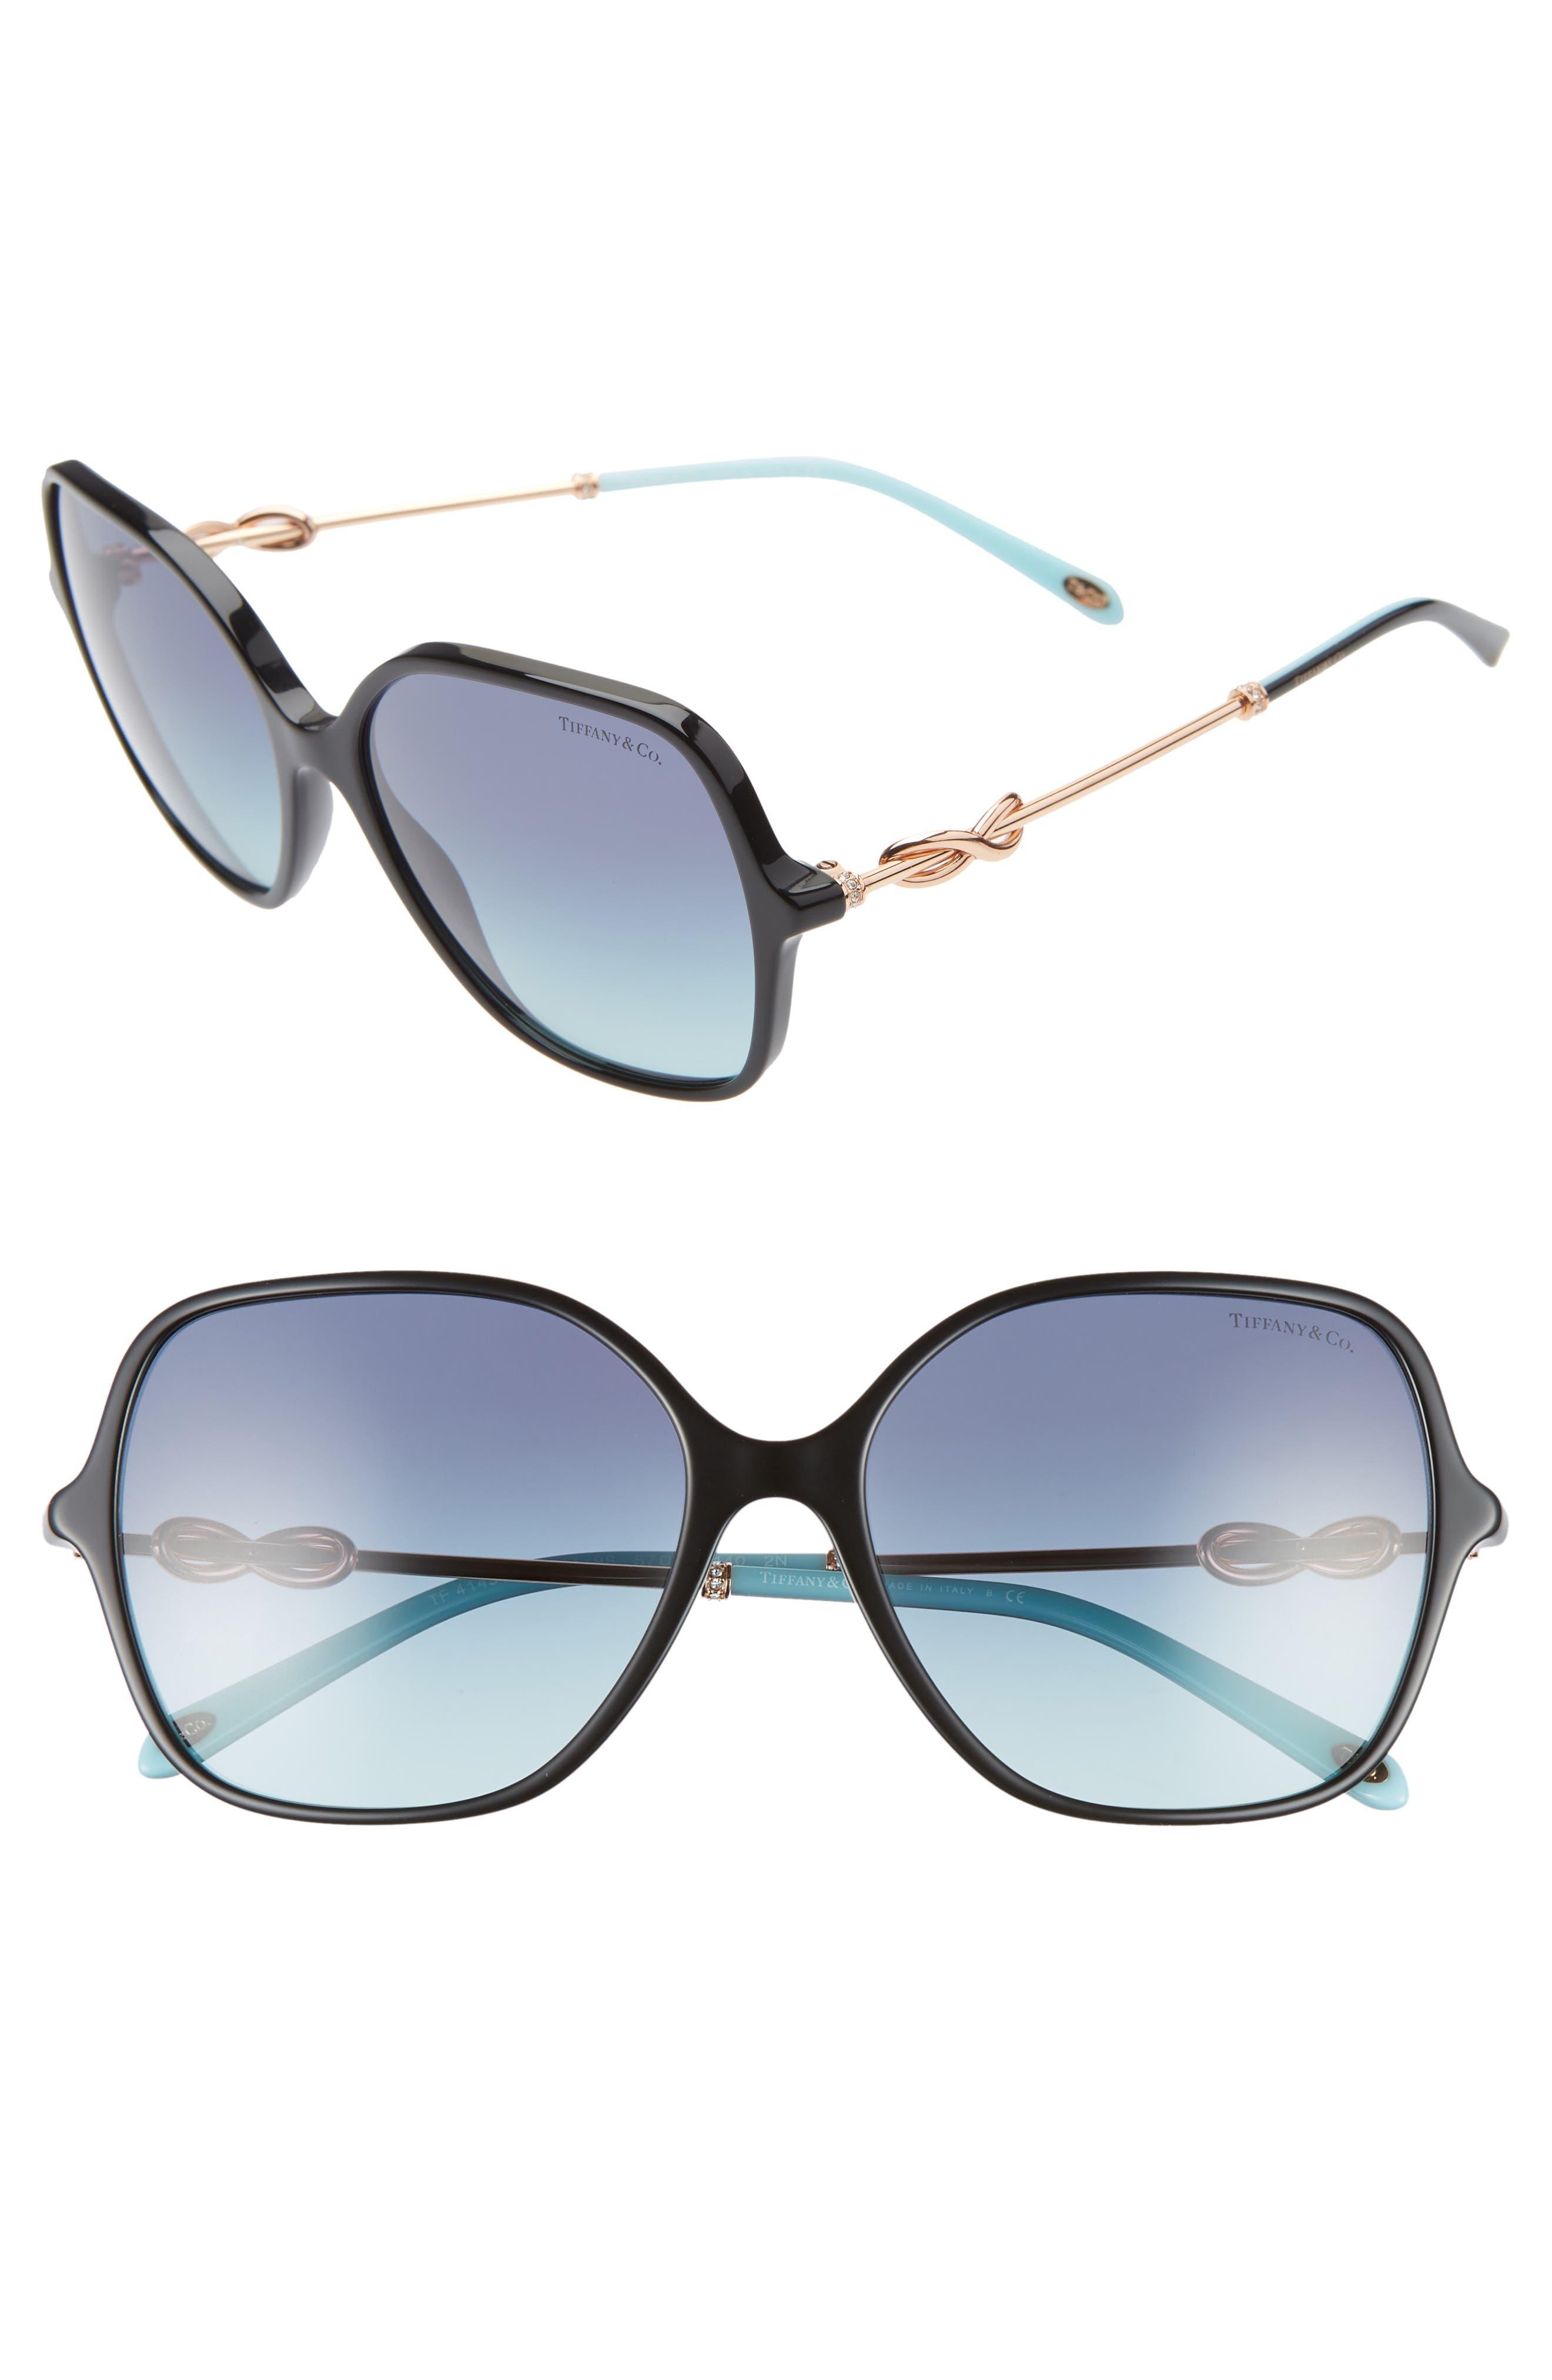 ac492ffd773 Women s Tiffany 57Mm Sunglasses - Black  Azure Gradient